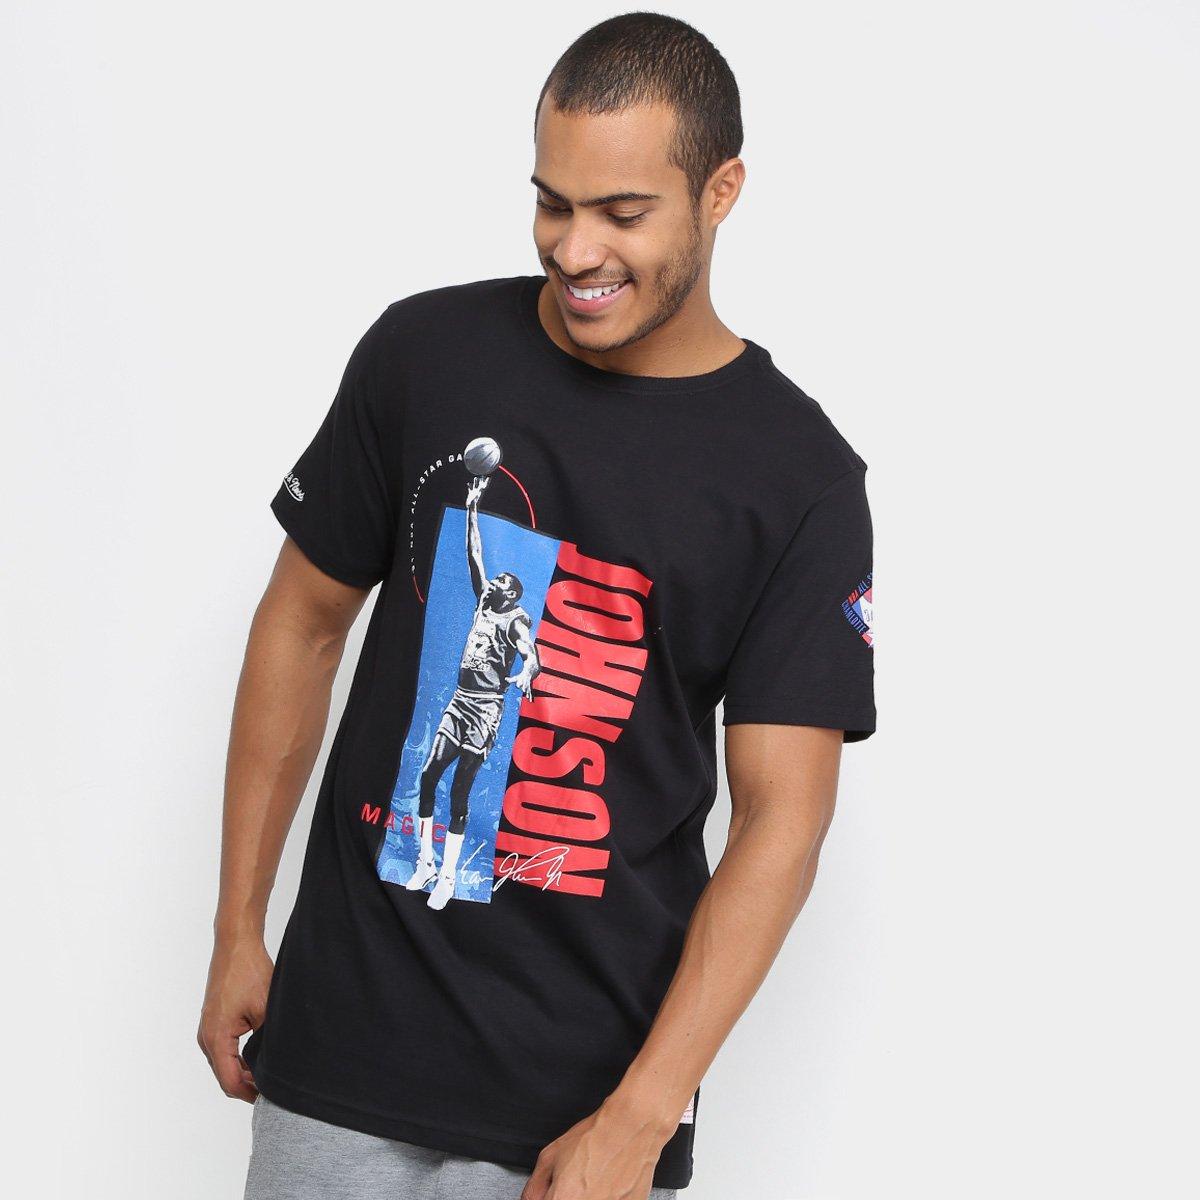 7867e20dd Camiseta Mitchell   Ness NBA Magic Johnson Masculina - Preto - Compre Agora